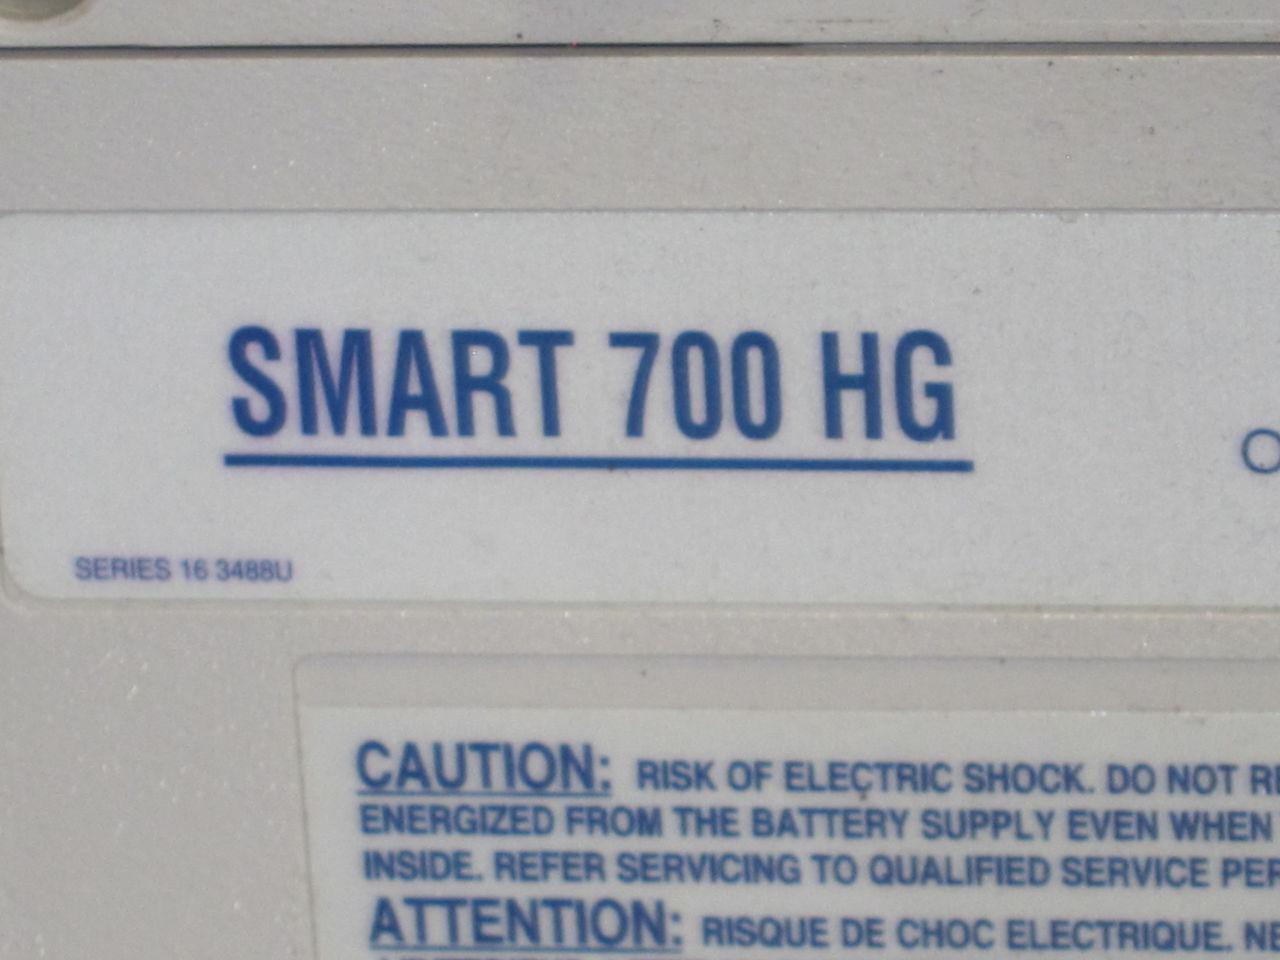 SMART UPS Smart 700 HG Uninterruptible Power Supply / UPS